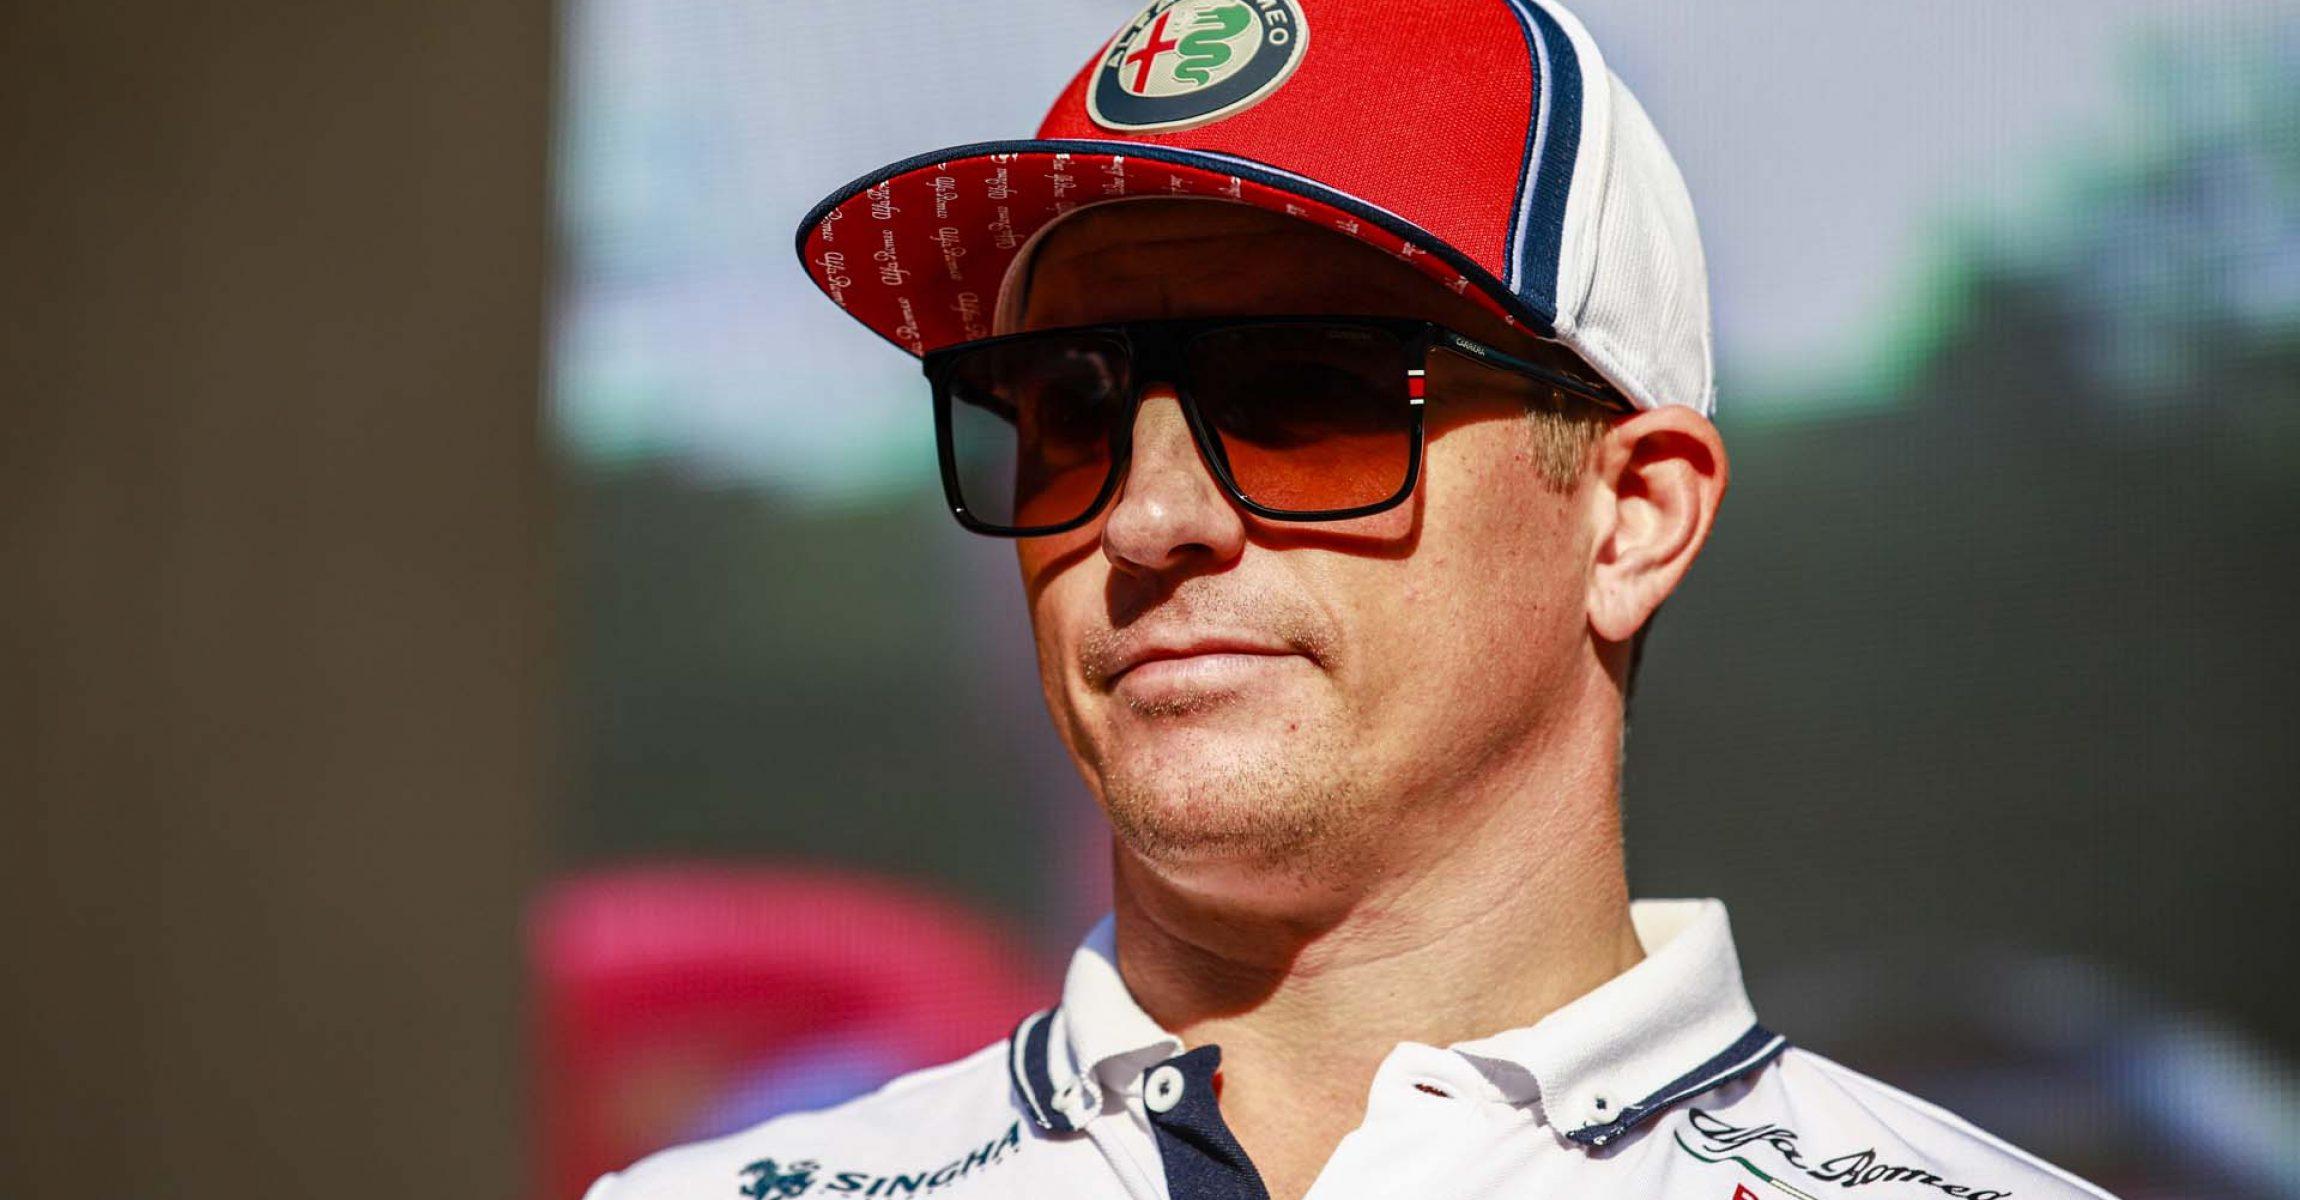 Kimi Räikkönen during 2019 Formula 1 FIA world championship, Italy Grand Prix, at Monza from september 5 to 9 - Photo Xavi Bonilla / DPPI